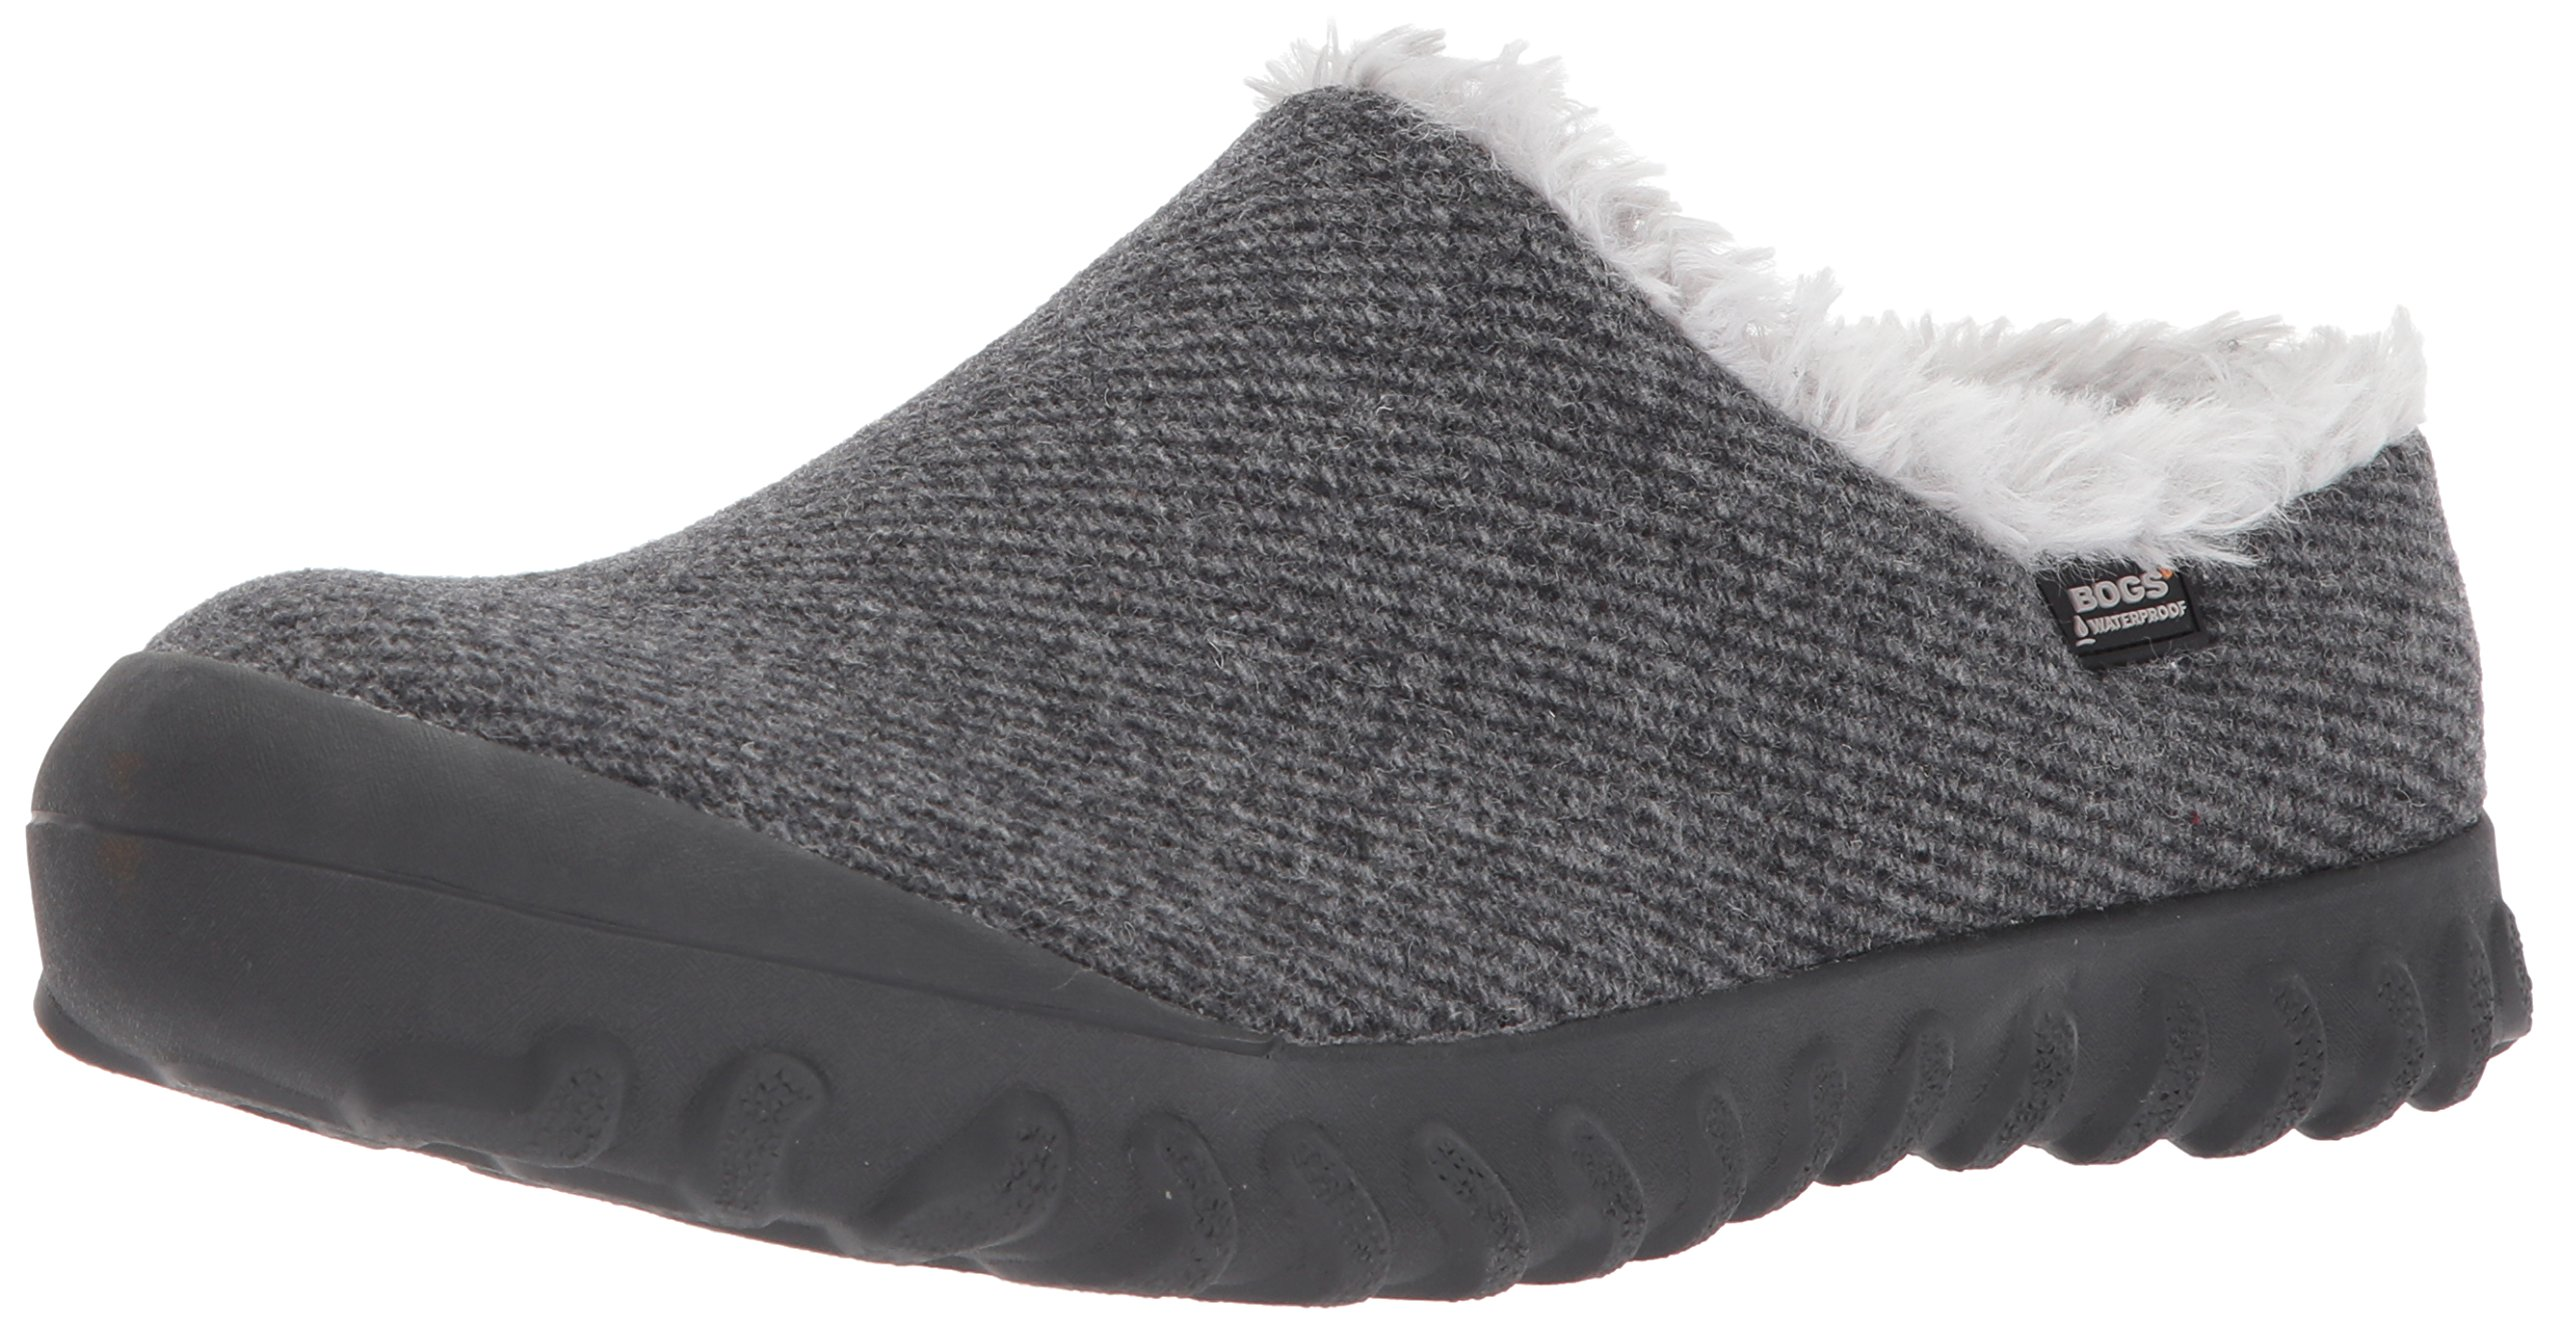 Bogs Women's Bmoc Slip on Wool Snow Boot, Charcoal, 11 M US